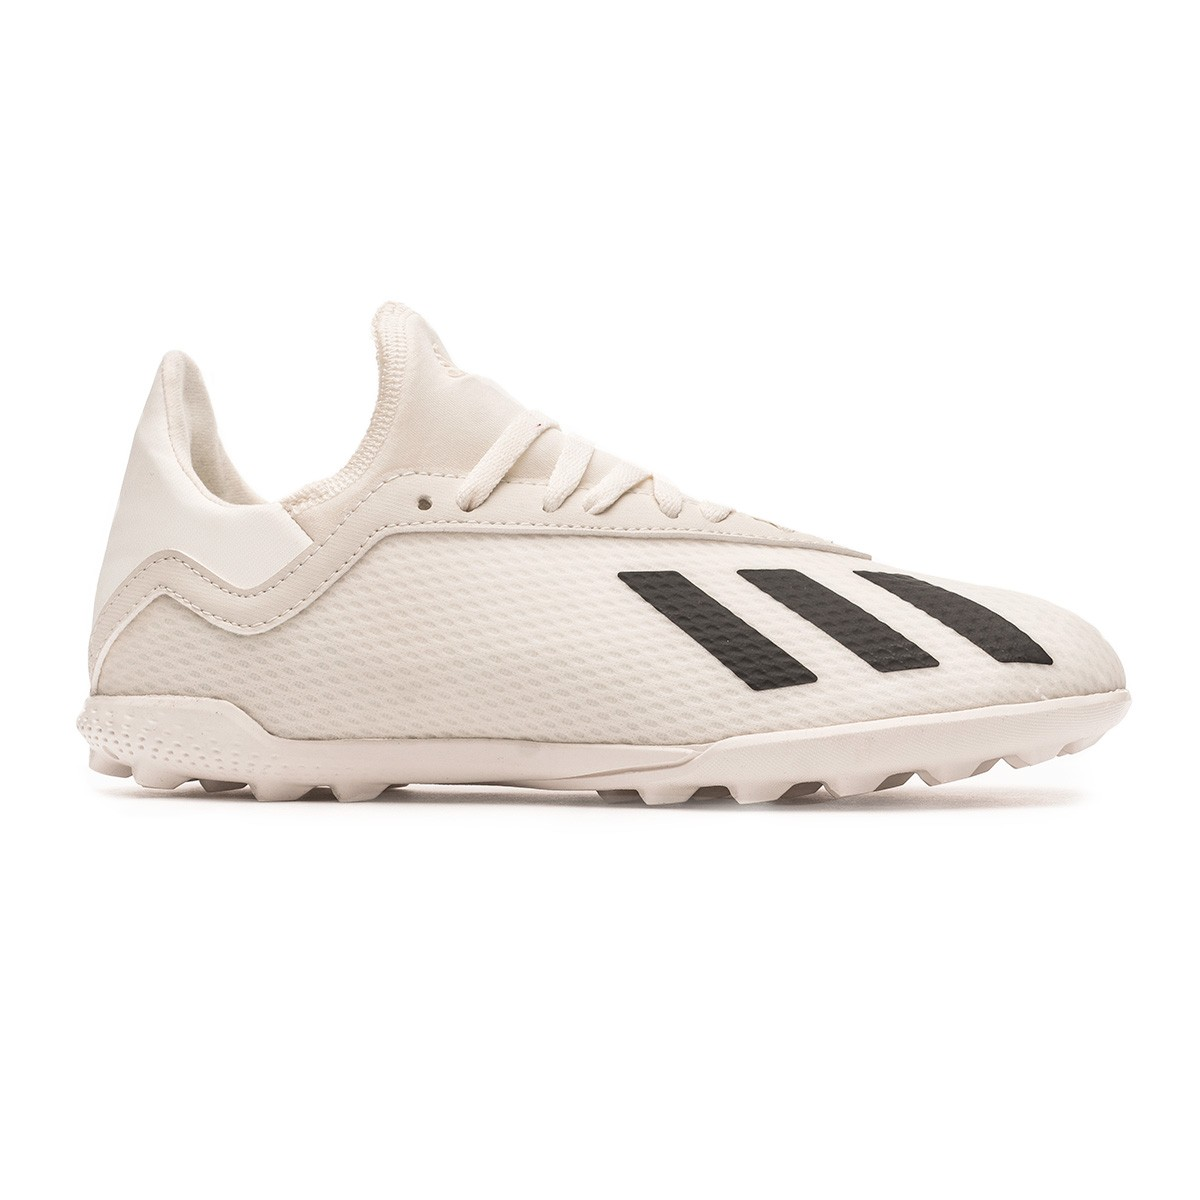 ceb319230 Football Boot adidas Kids X Tango 18.3 Turf Off white-White-Core black - Football  store Fútbol Emotion